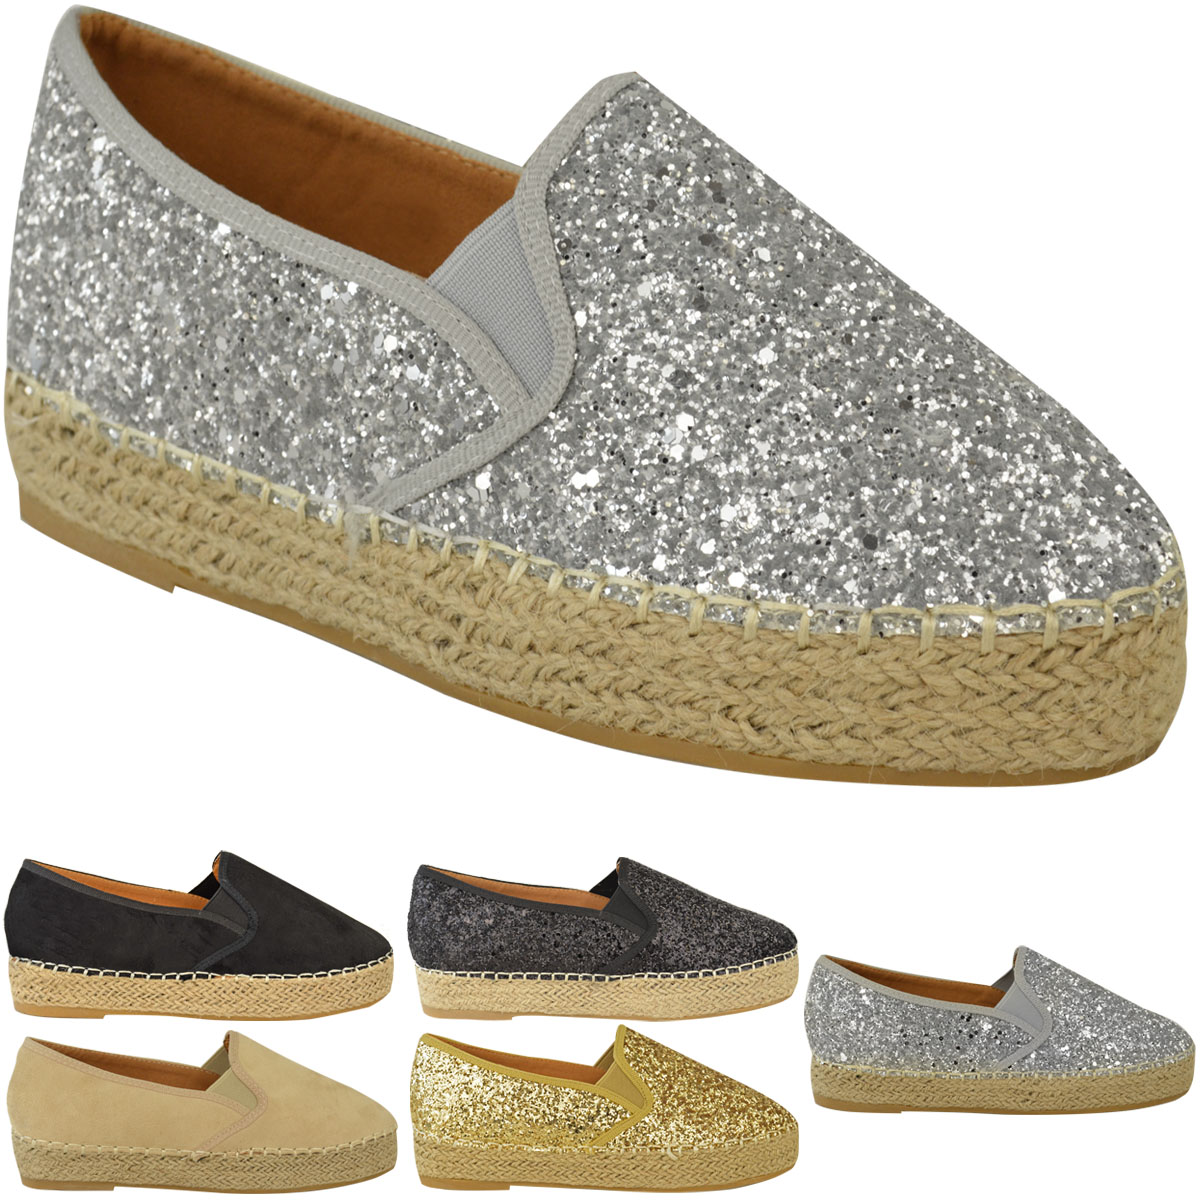 Womens Ladies Flat Sandals Espadrille Glitter Slip On Plimsoll Pump Shoe Size